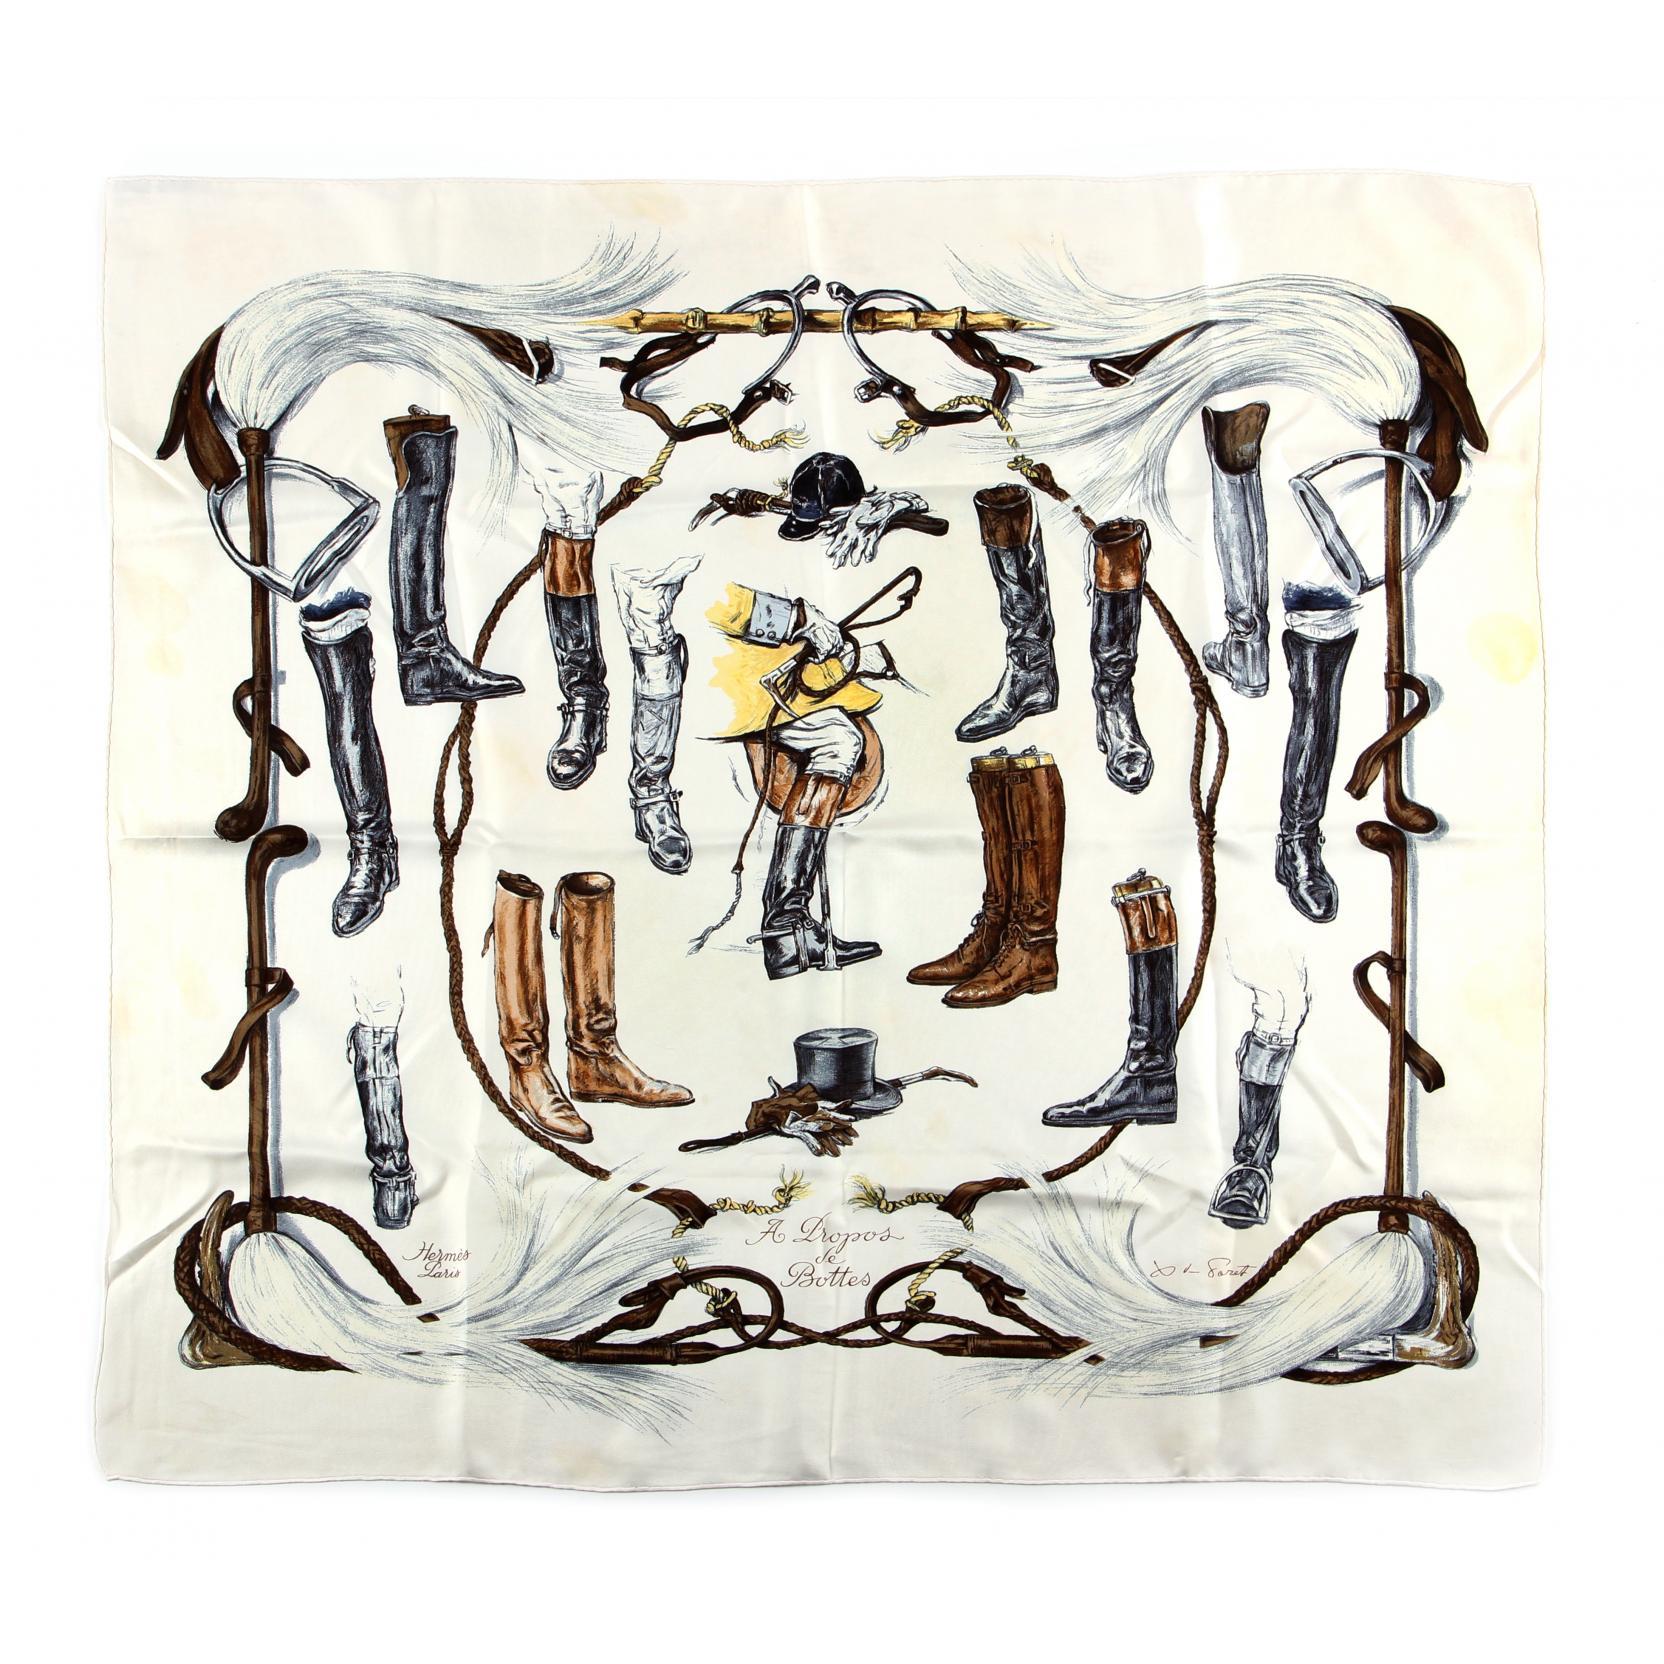 silk-scarf-a-propos-de-bottes-hermes